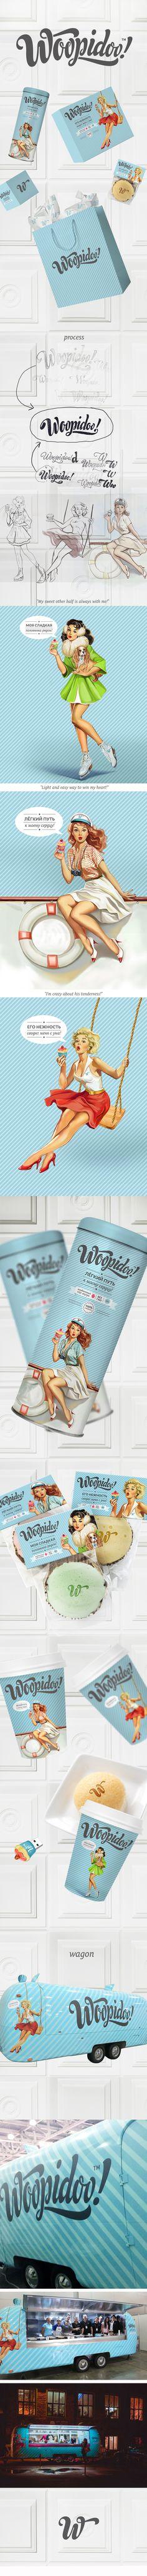 Packaging Design / Woopidoo by Valeria Polubiatko 配色~粉藍與灰,即使配圖人物色彩濃郁整體還是小有氣質